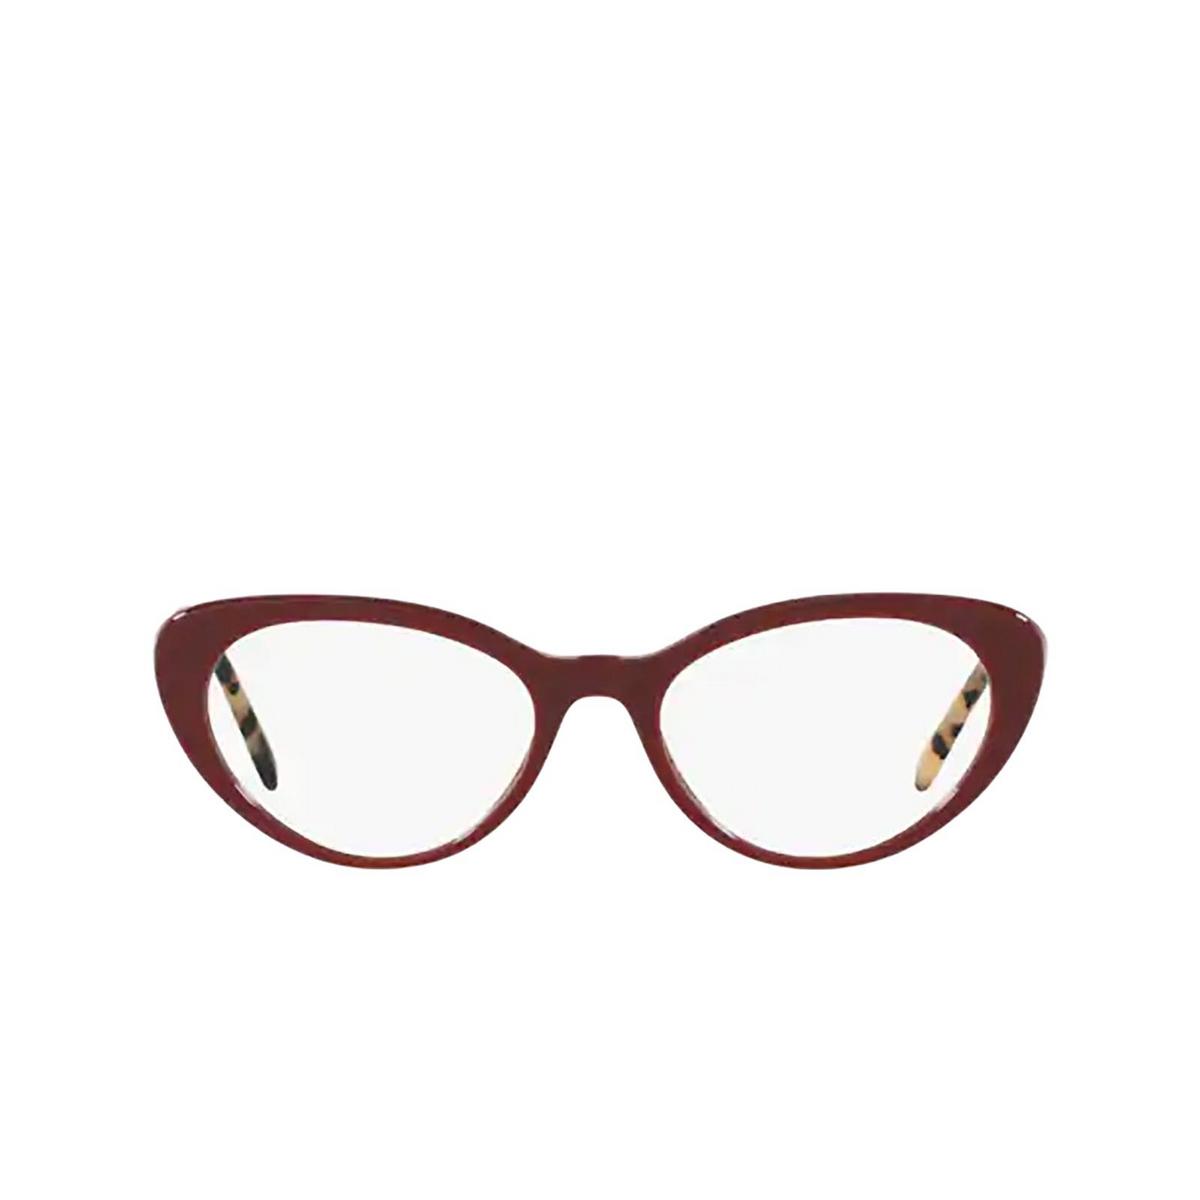 Miu Miu® Cat-eye Eyeglasses: MU 05RV color Bordeaux USH1O1 - front view.